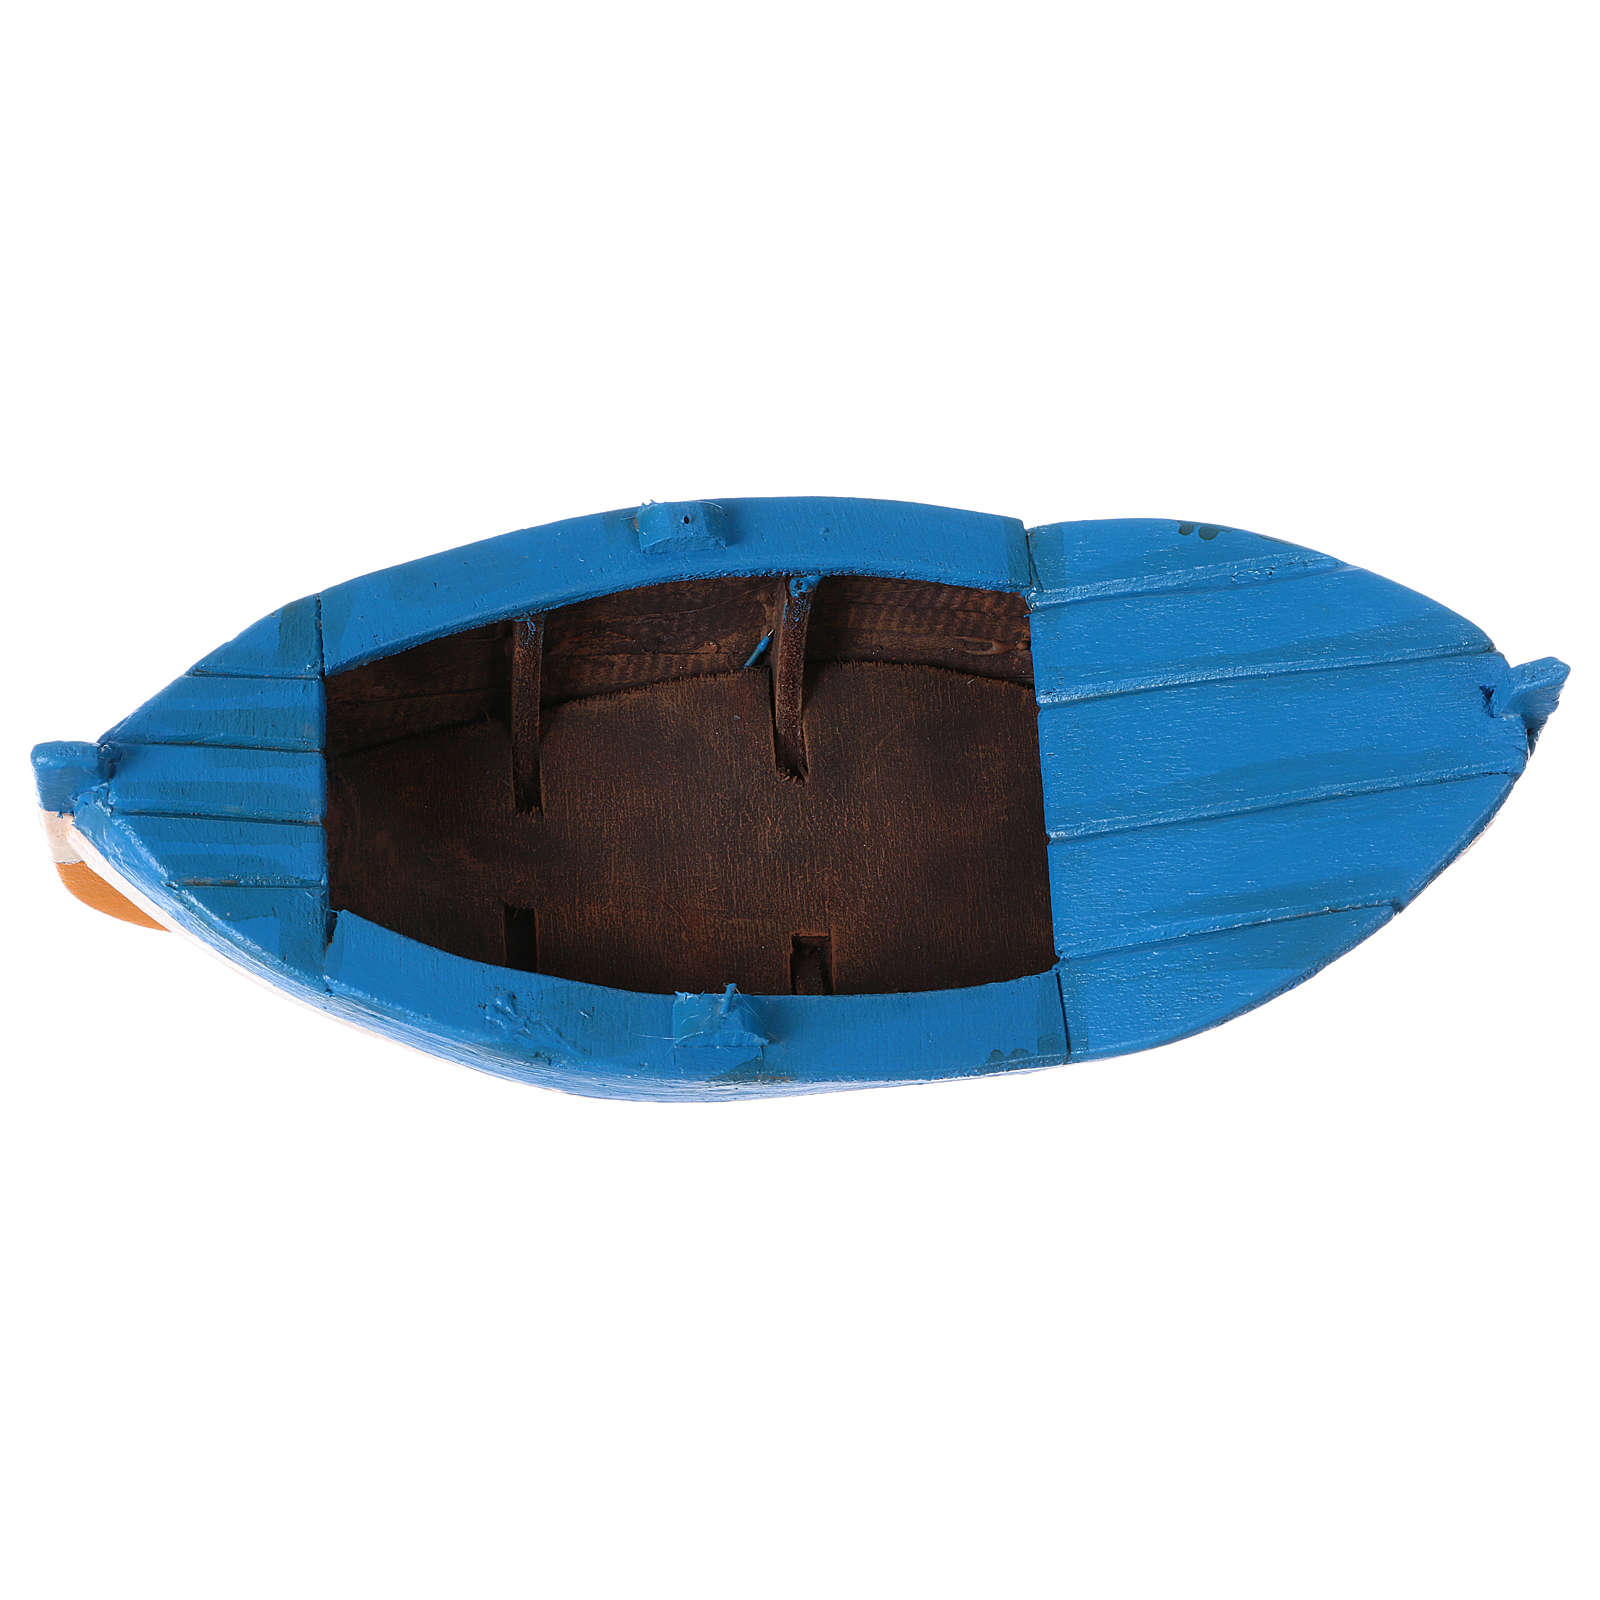 Bote de remos en Miniatura 7x21x9 cm 4